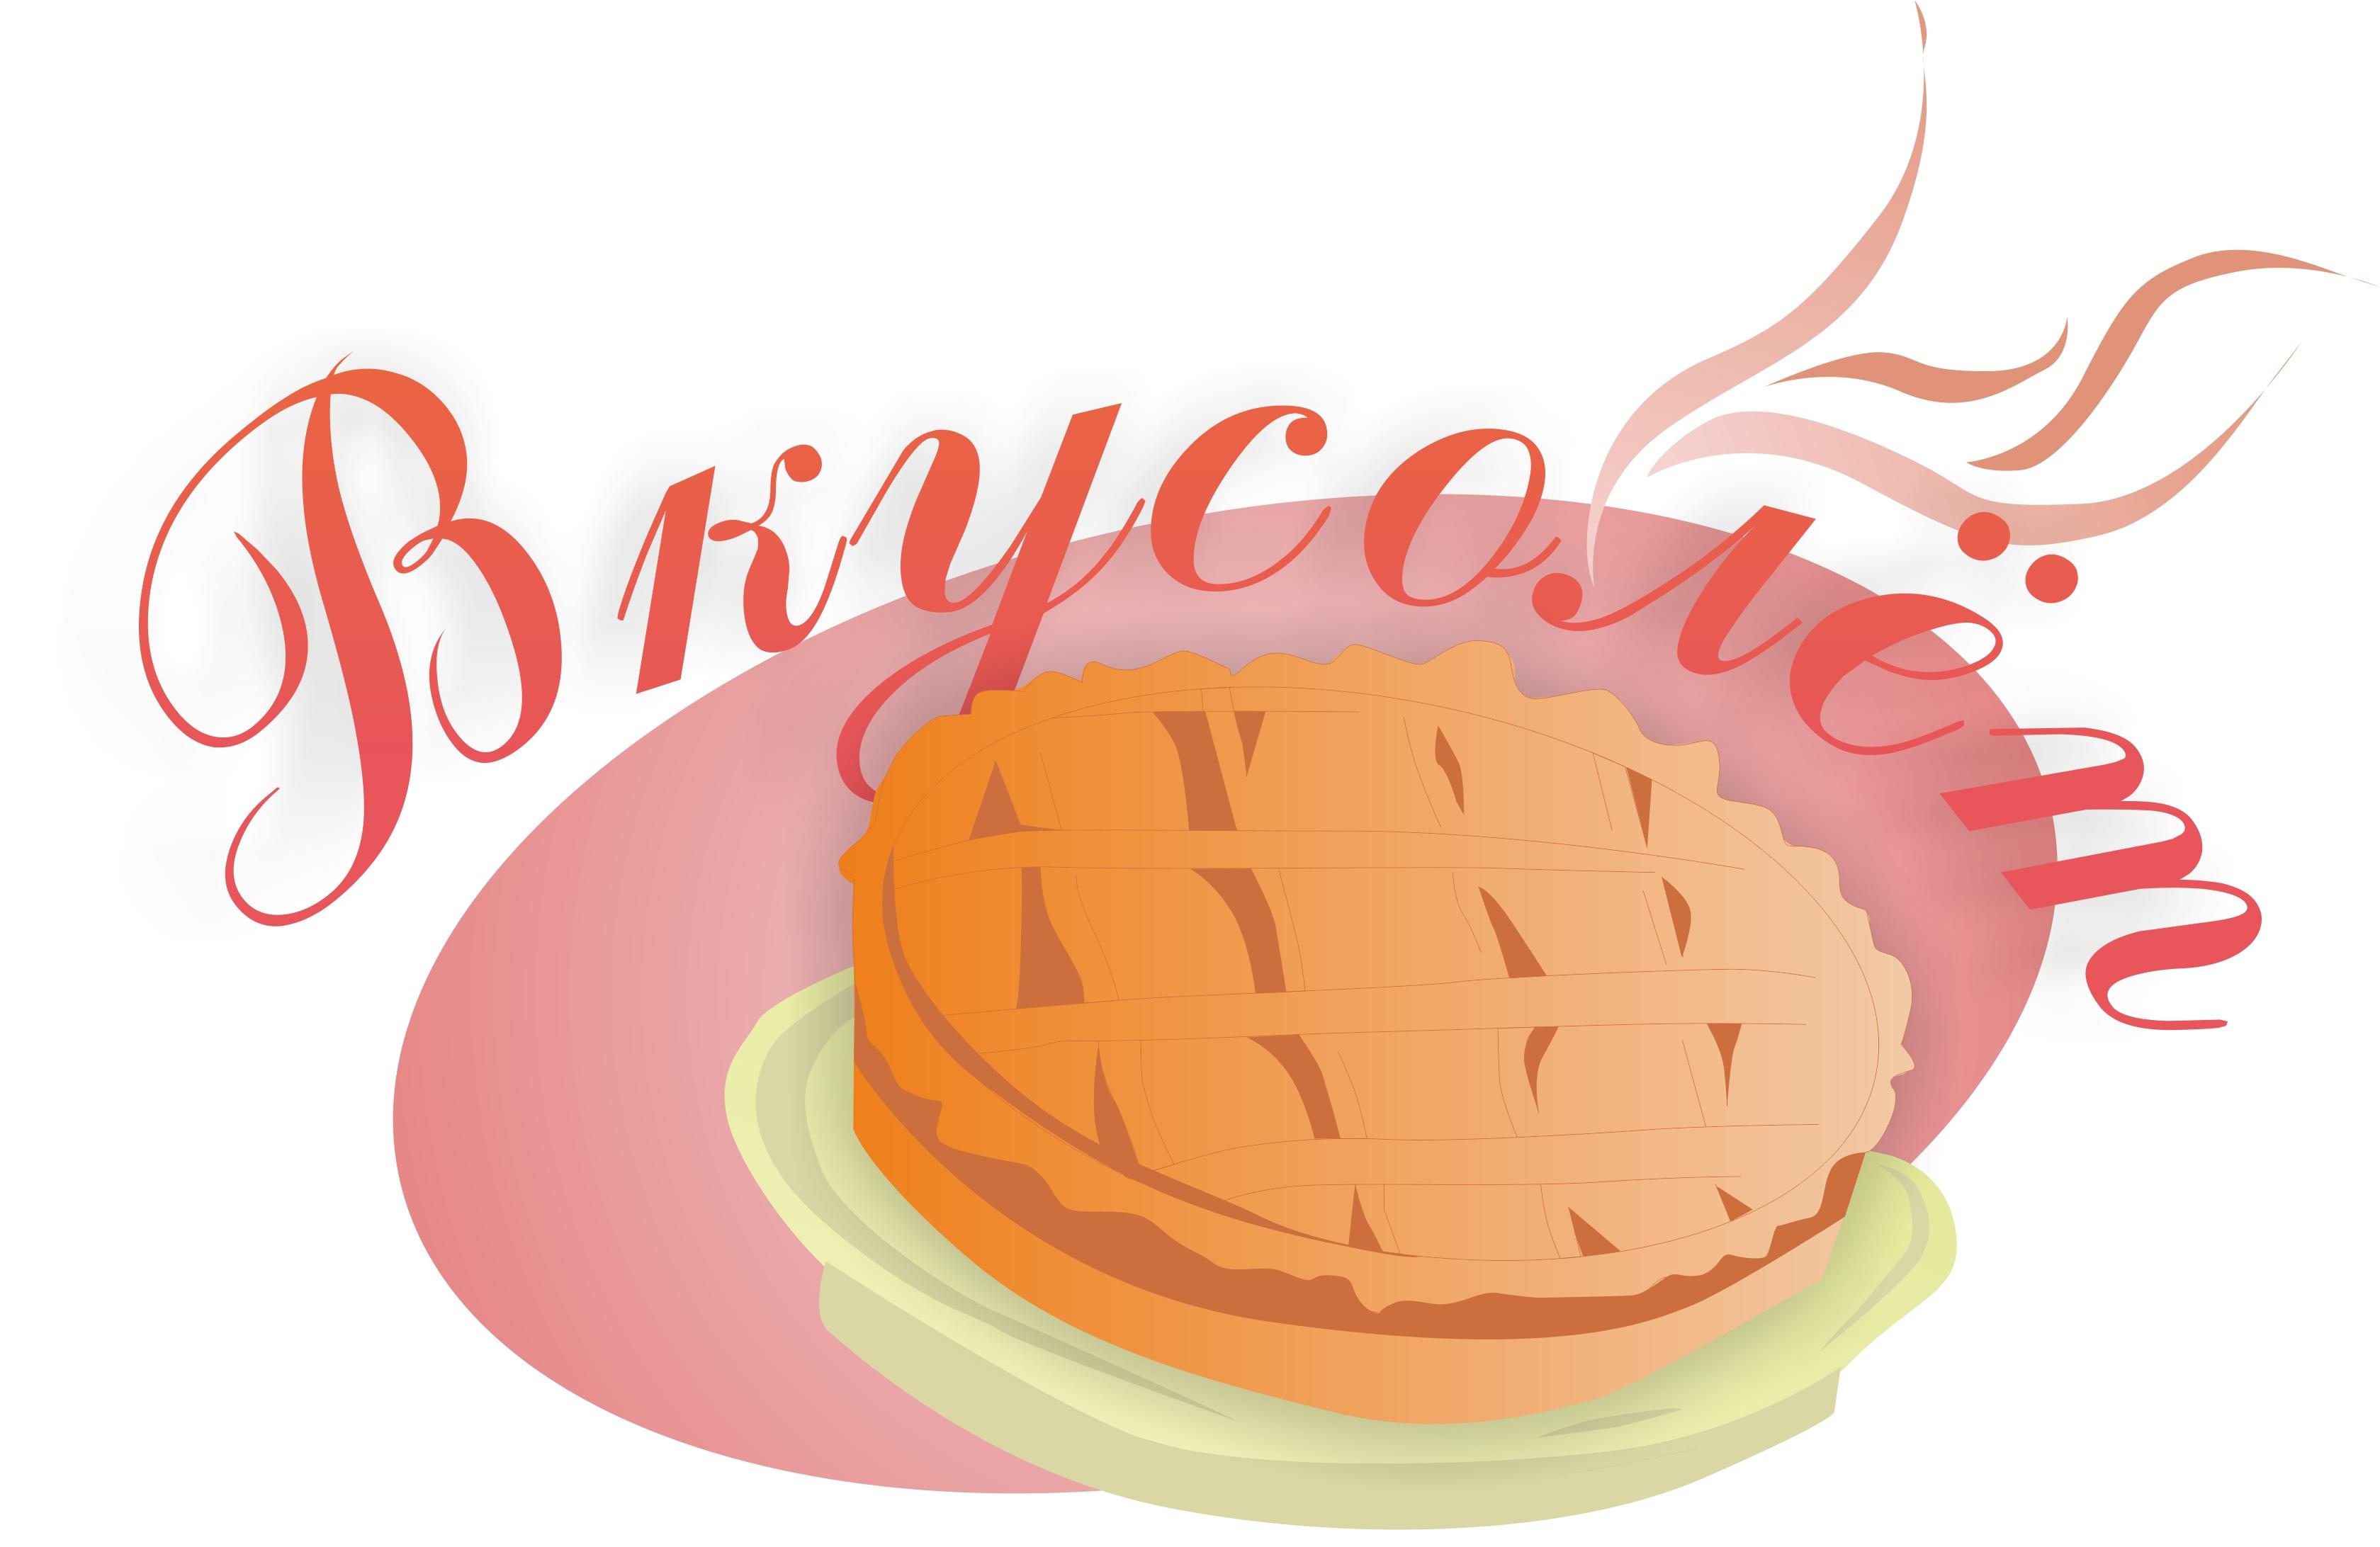 Логотип для доставки еды фото f_25359d4a49846c17.jpg